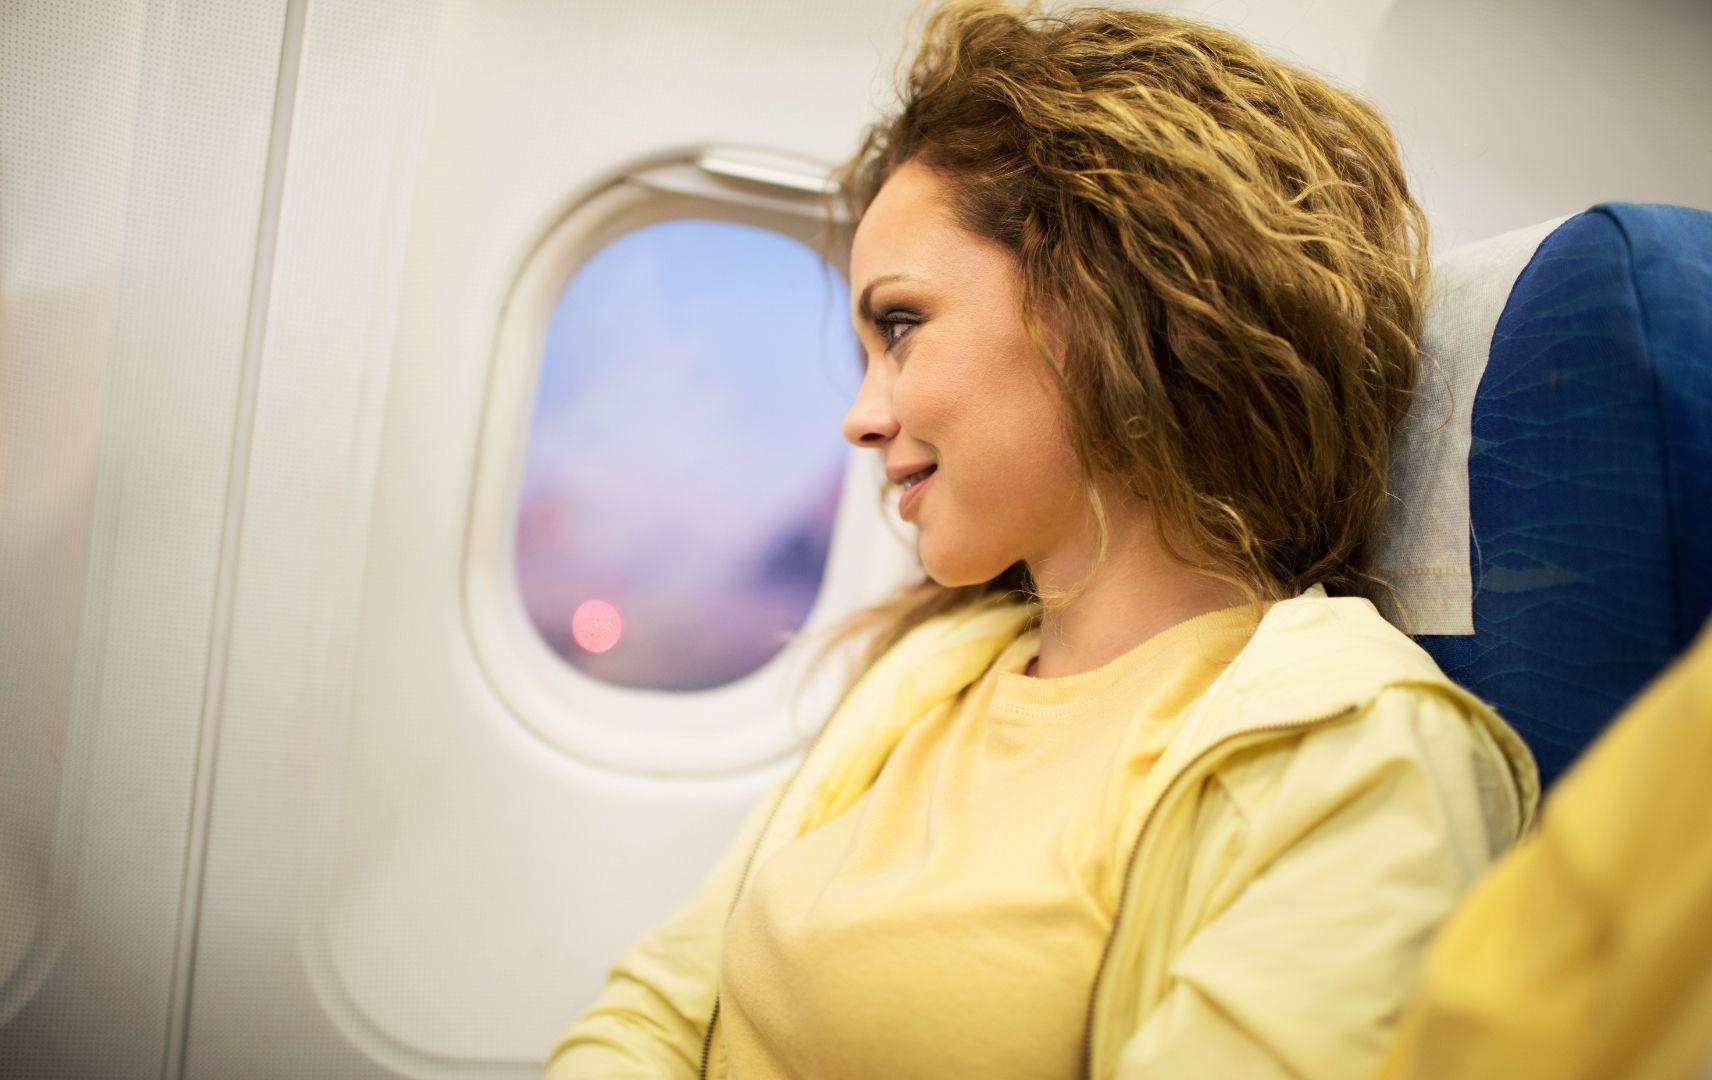 Frau in Flugzeug, Reisebekleidung